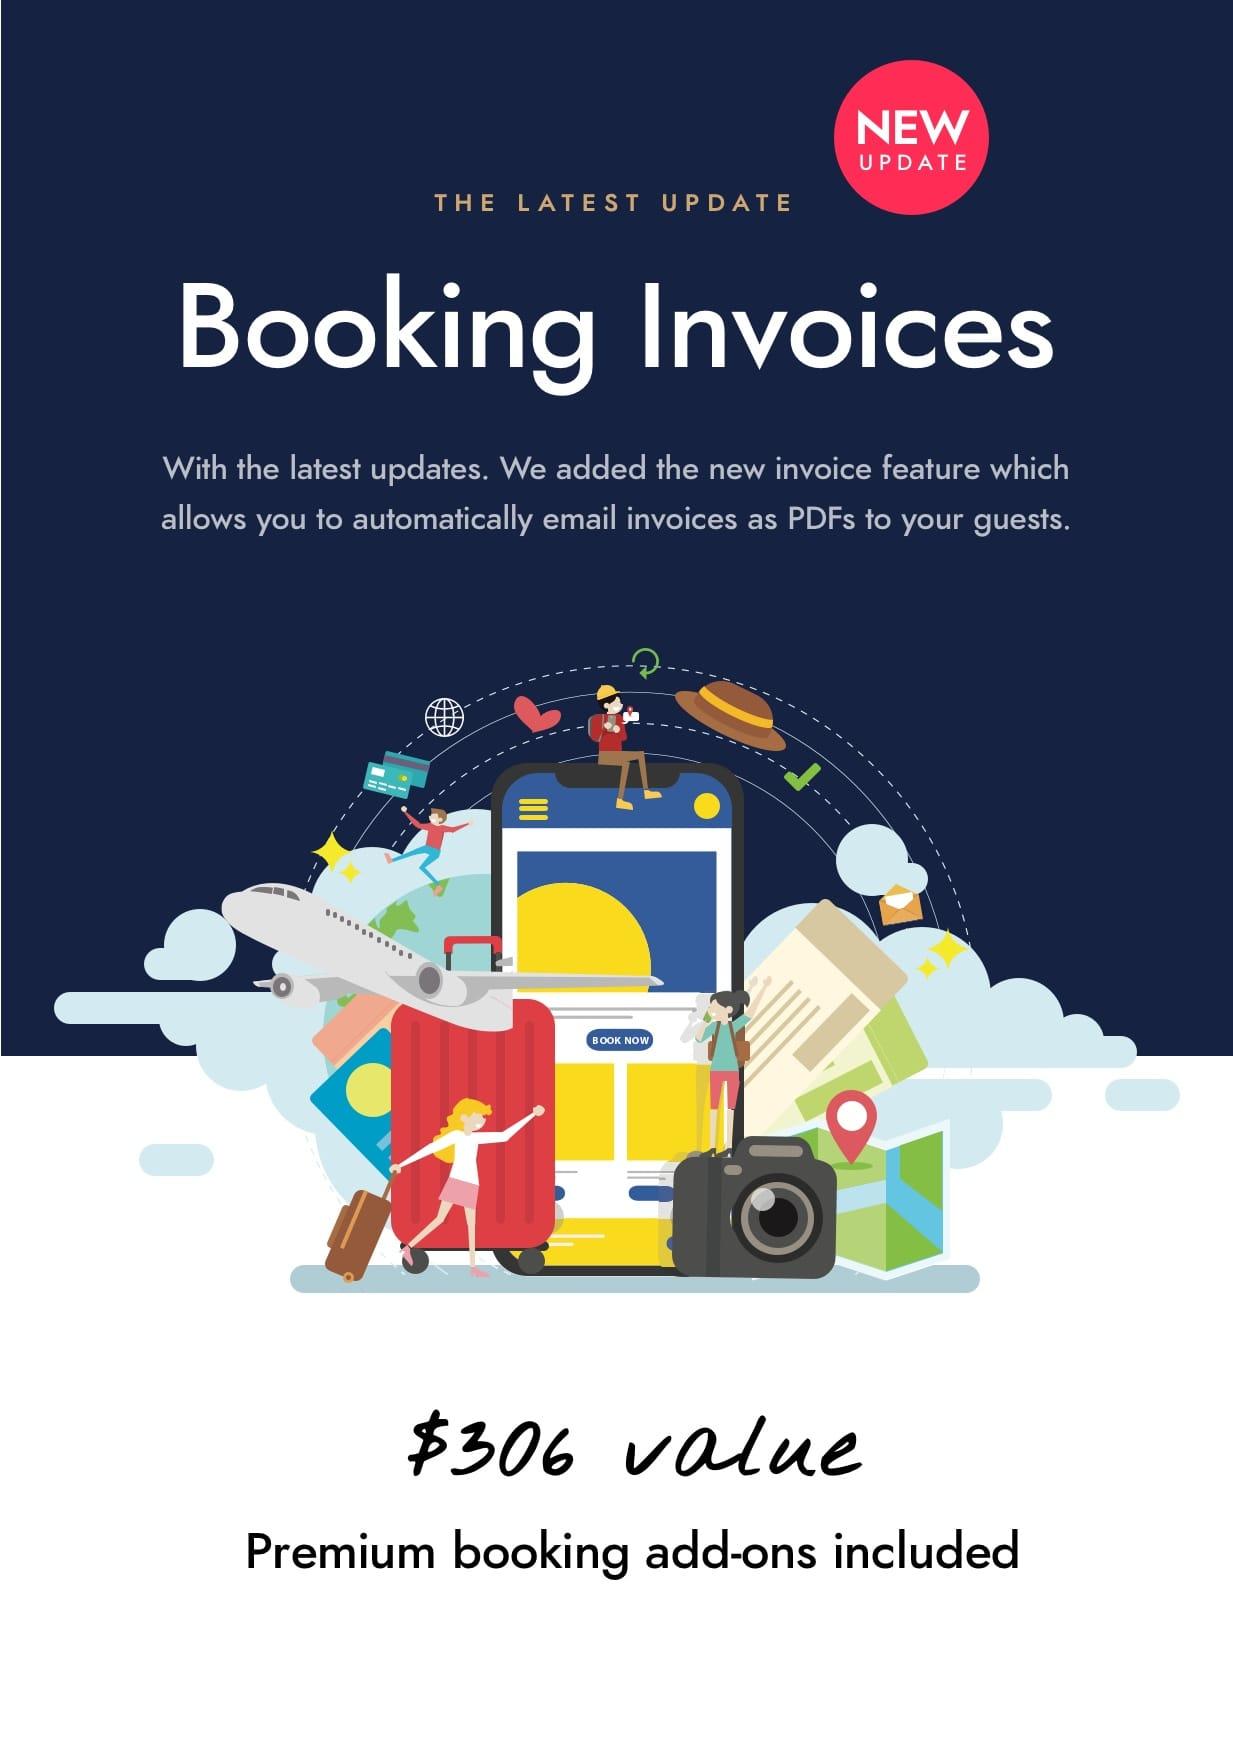 pdf invoices - Hotel Booking WordPress